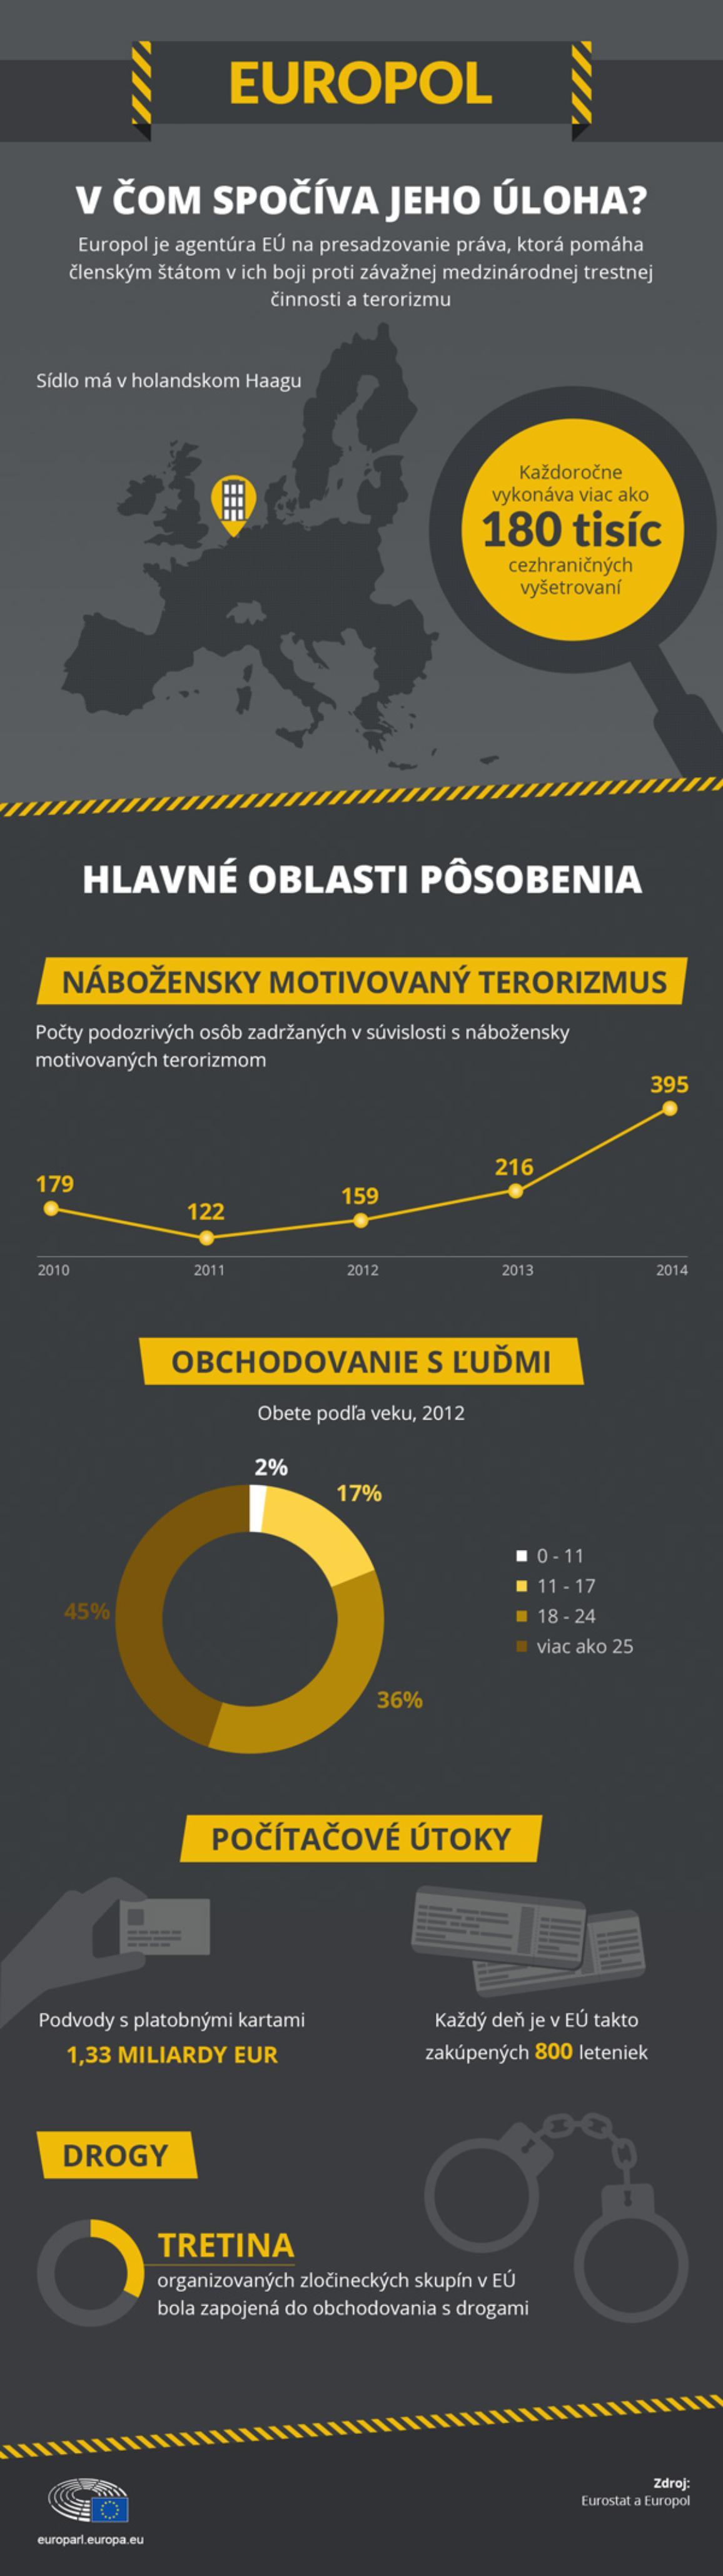 Infografika o Europole